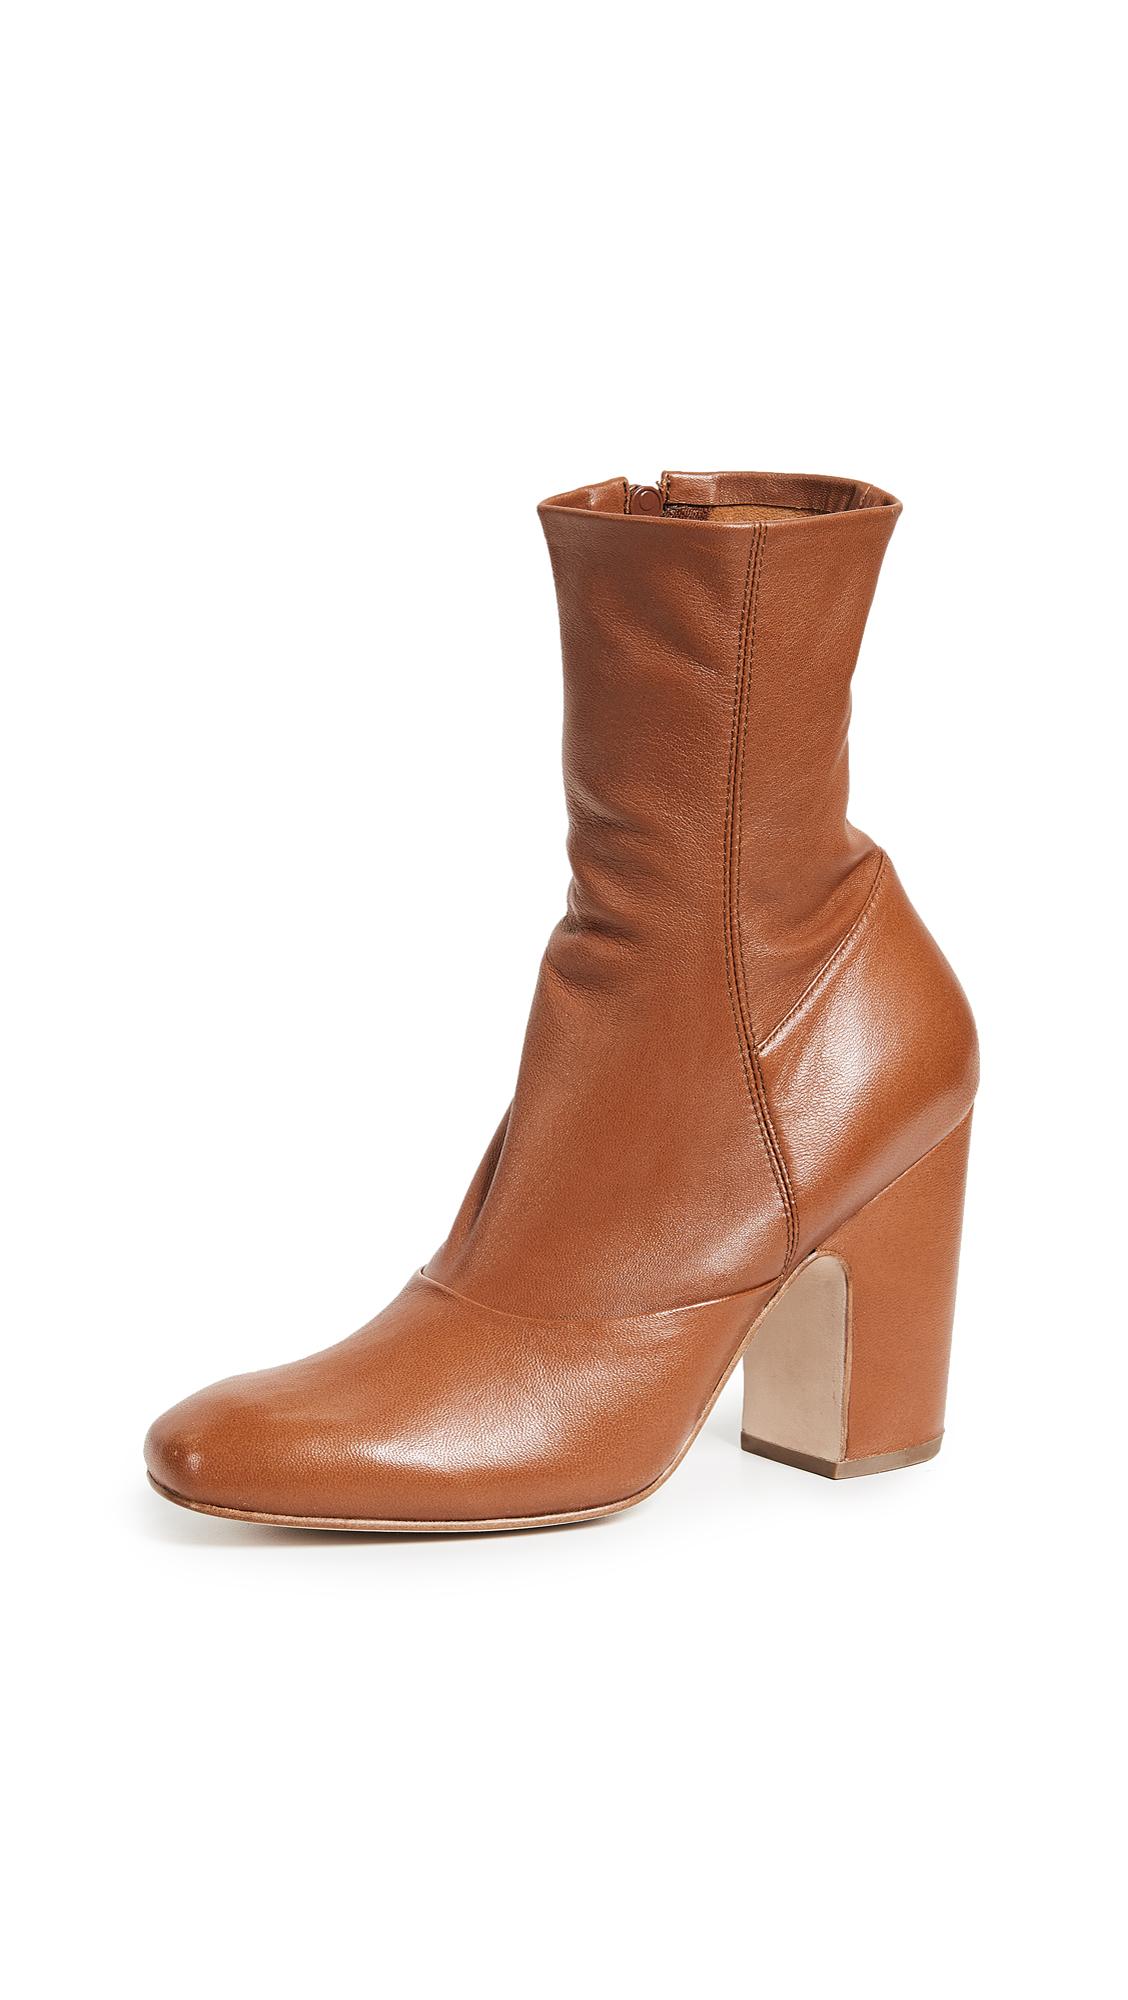 Photo of Rachel Comey Saco Booties online shoes sales